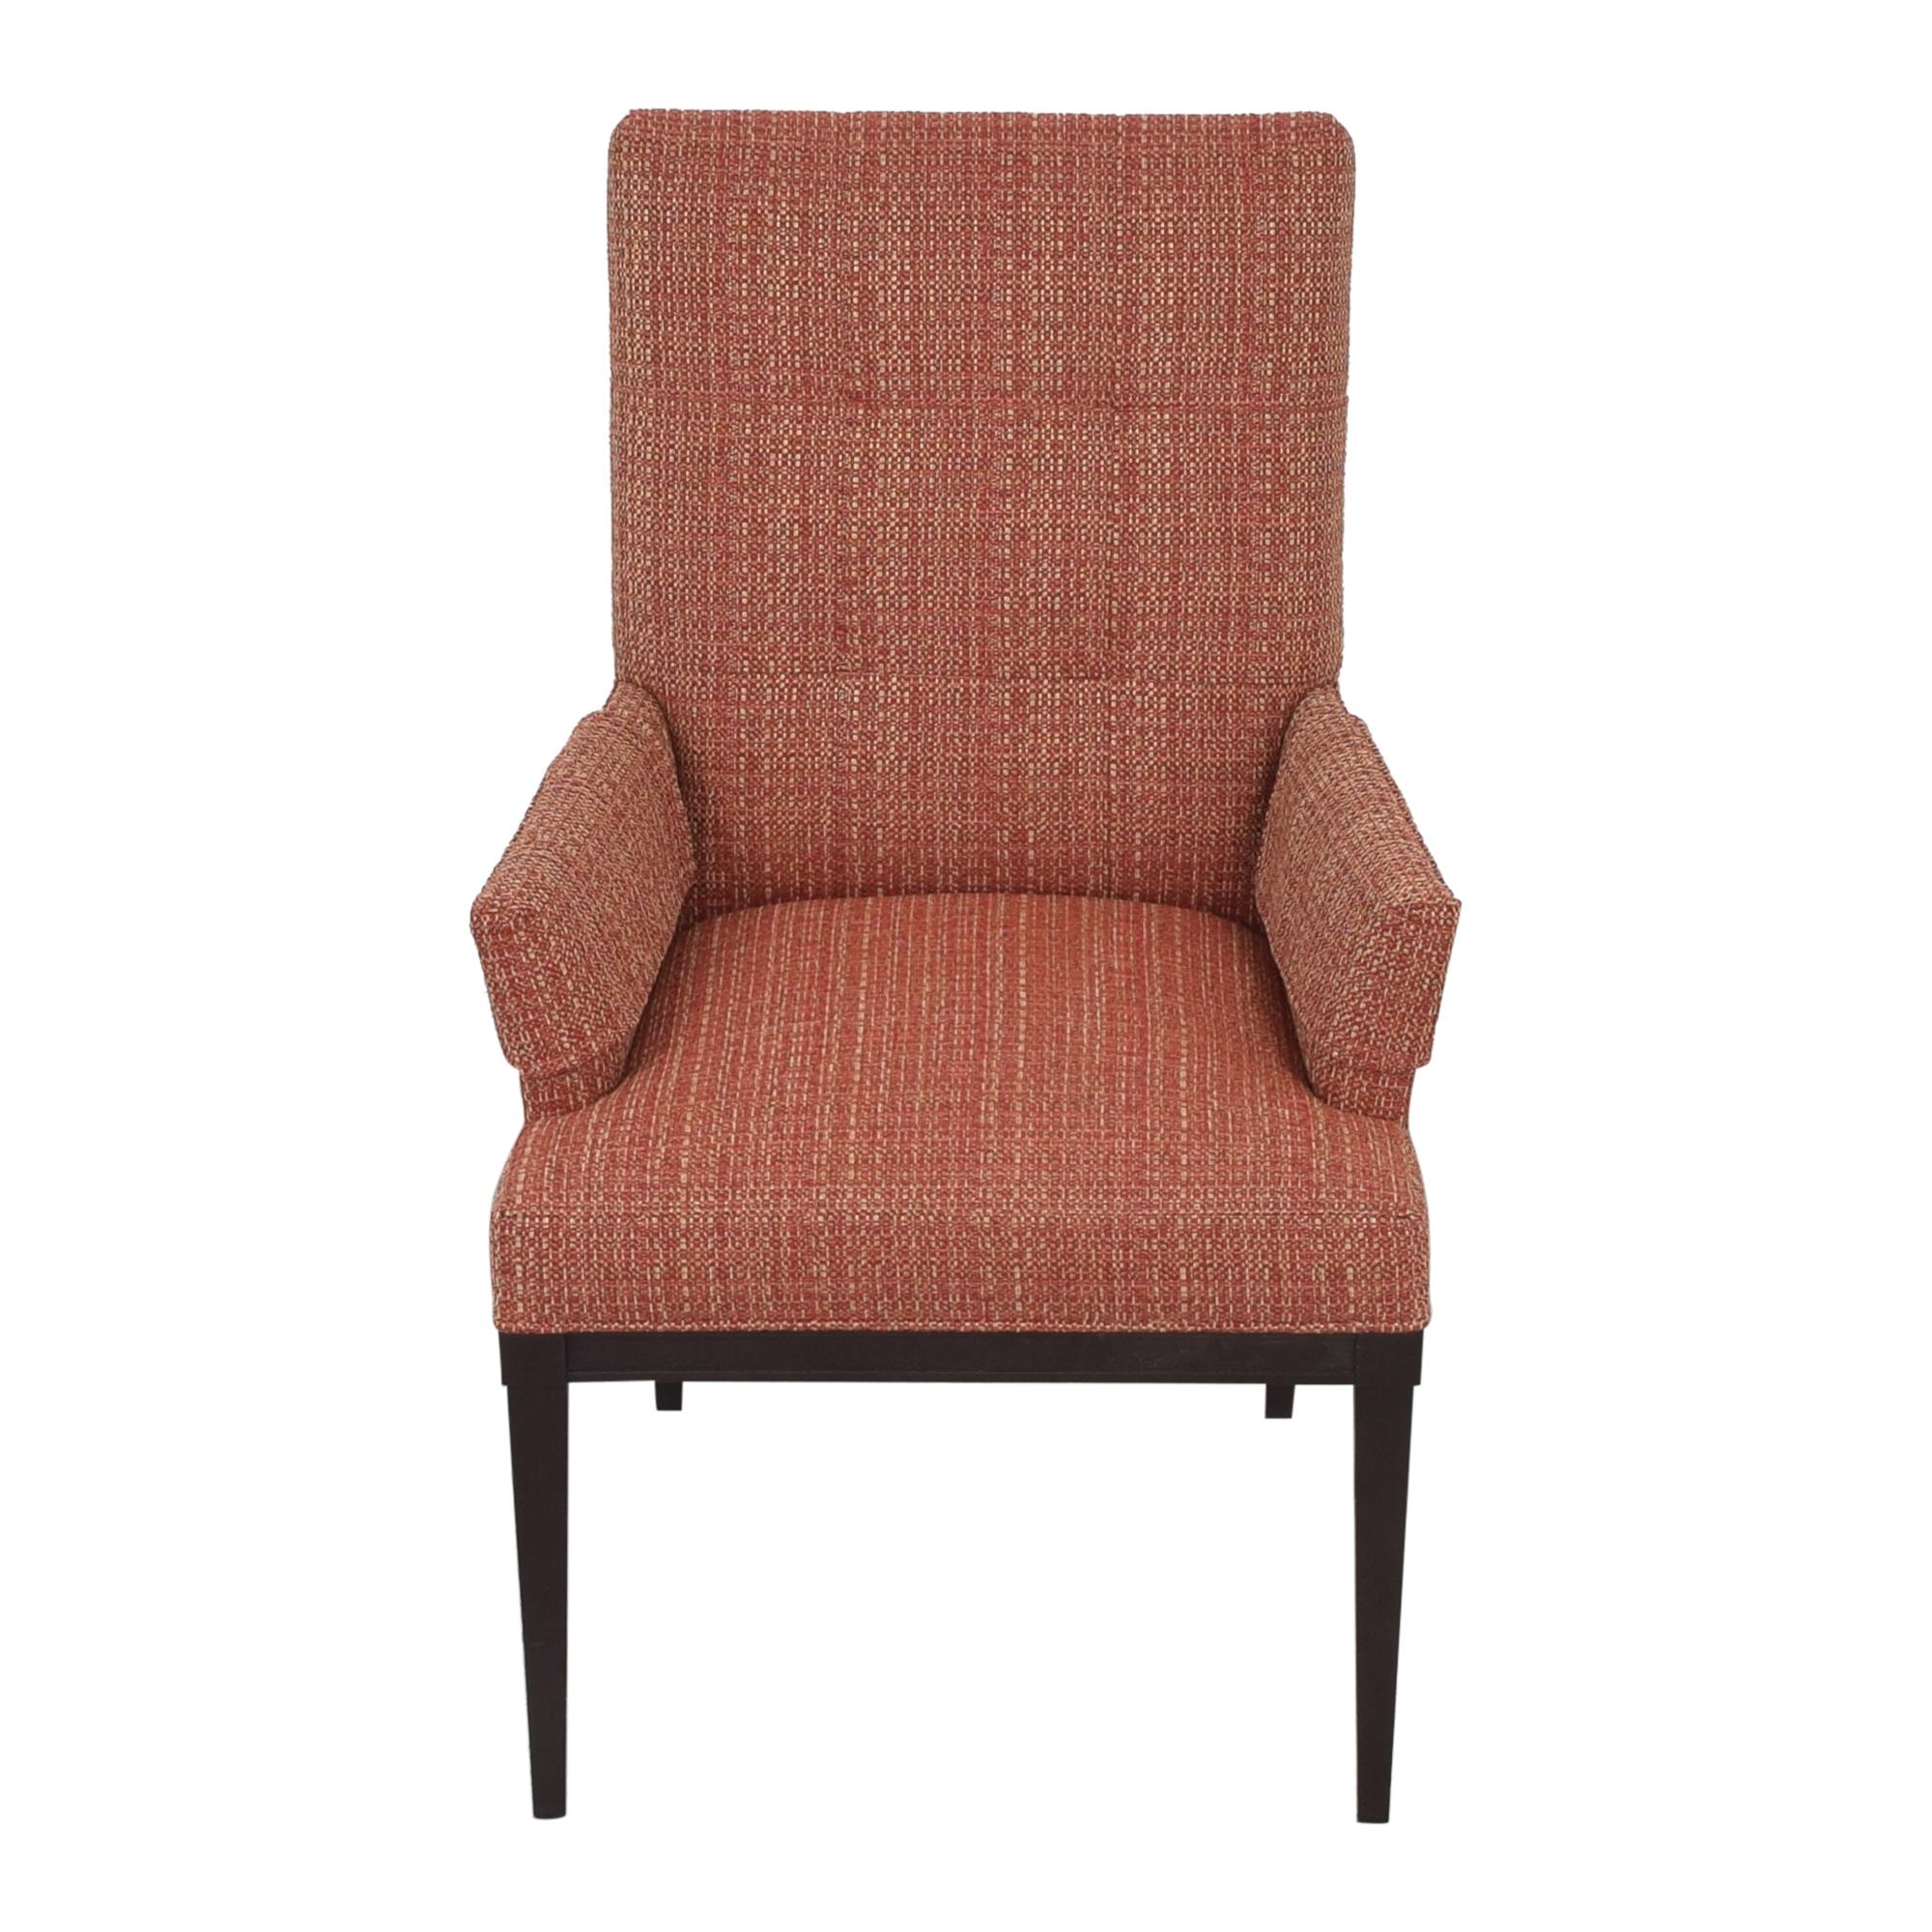 Ethan Allen Ethan Allen Thomas Armchair Chairs